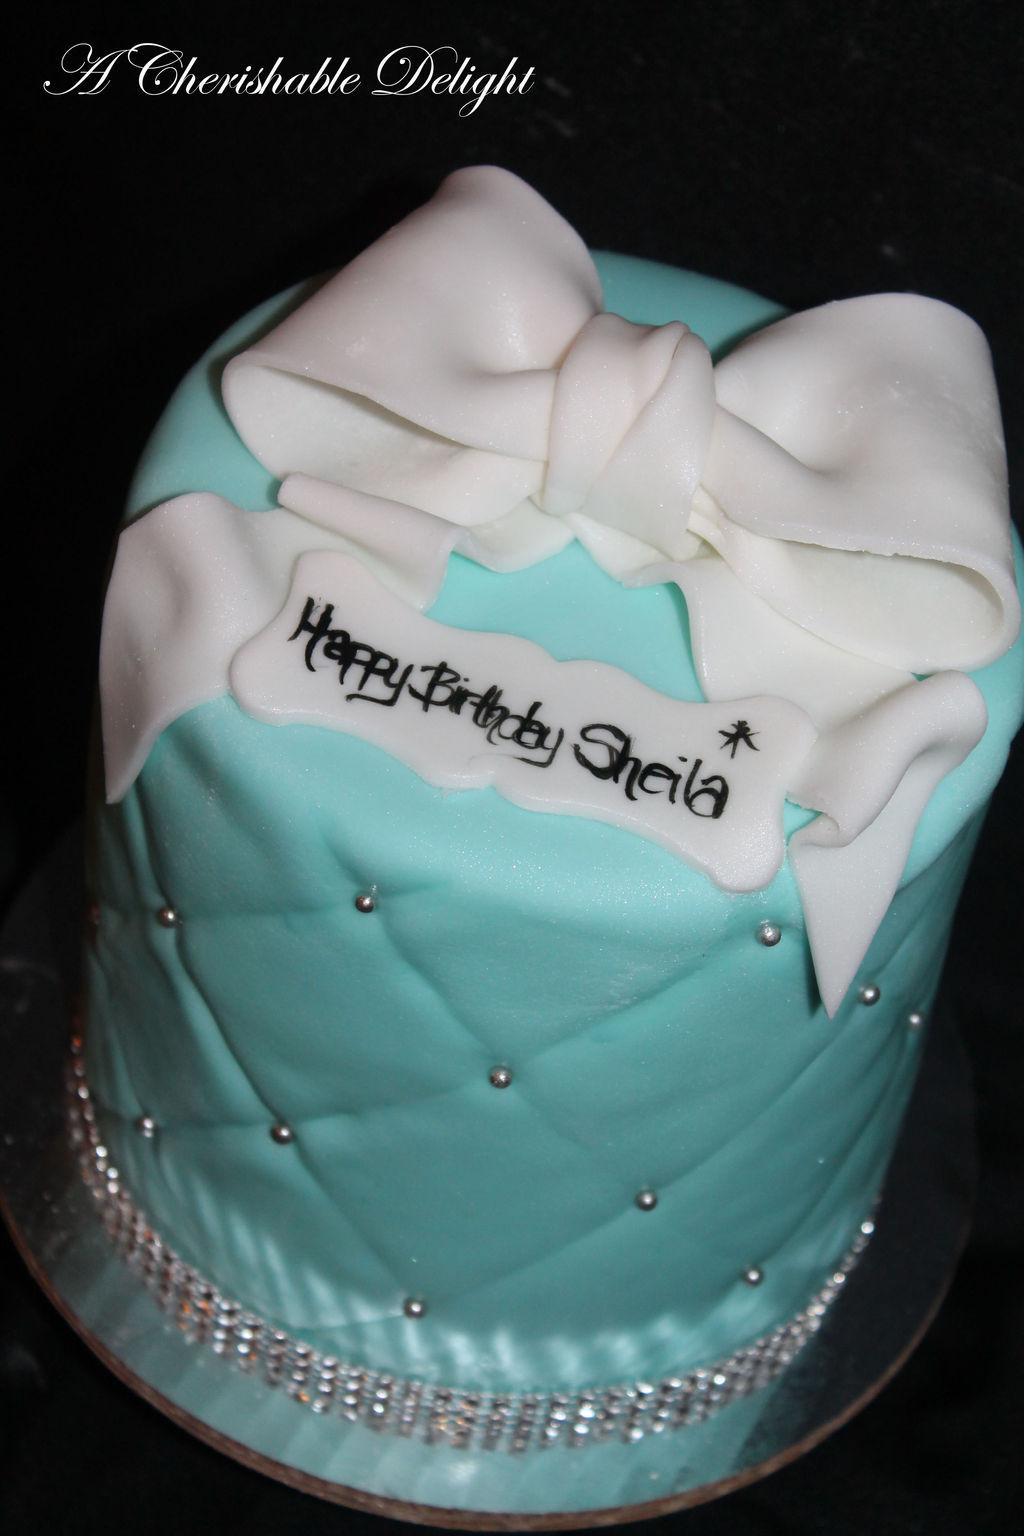 A Cherishable Delight Cakes Cupcakes Cookies Wix Com